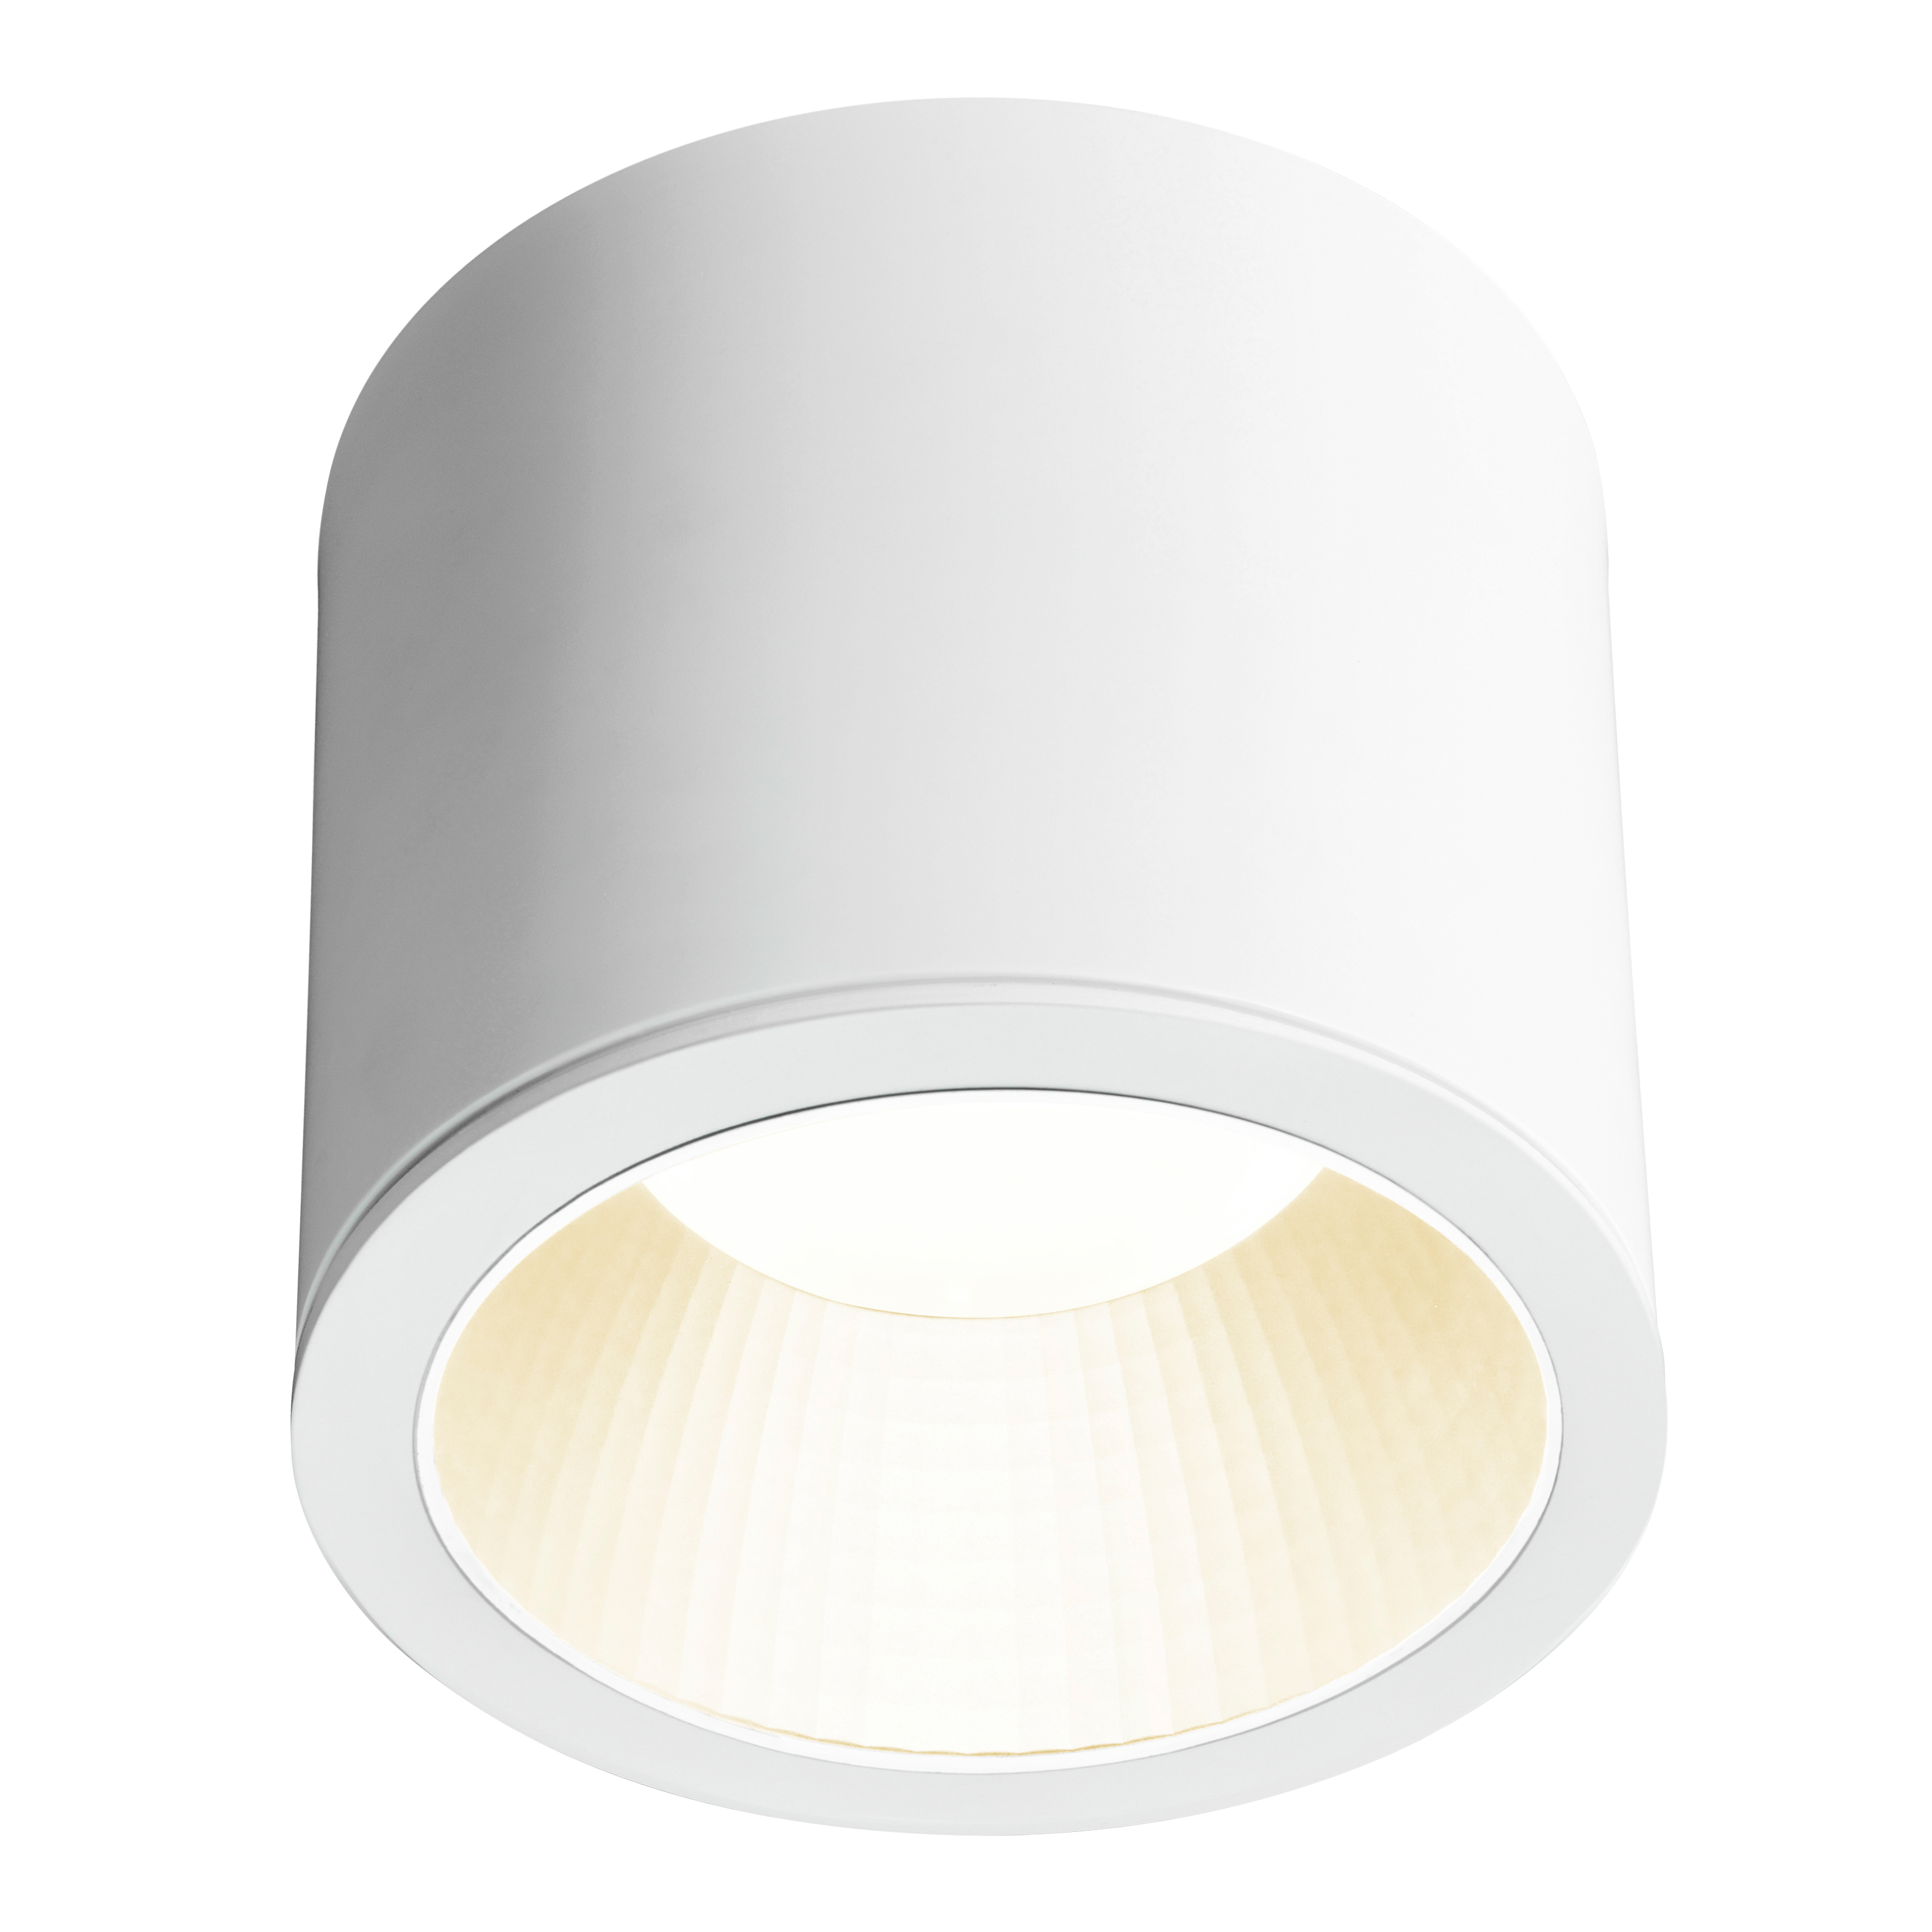 SOLINA 242 LED 18W 1900lm/830 MAT IP20 70° weiß GEN.2